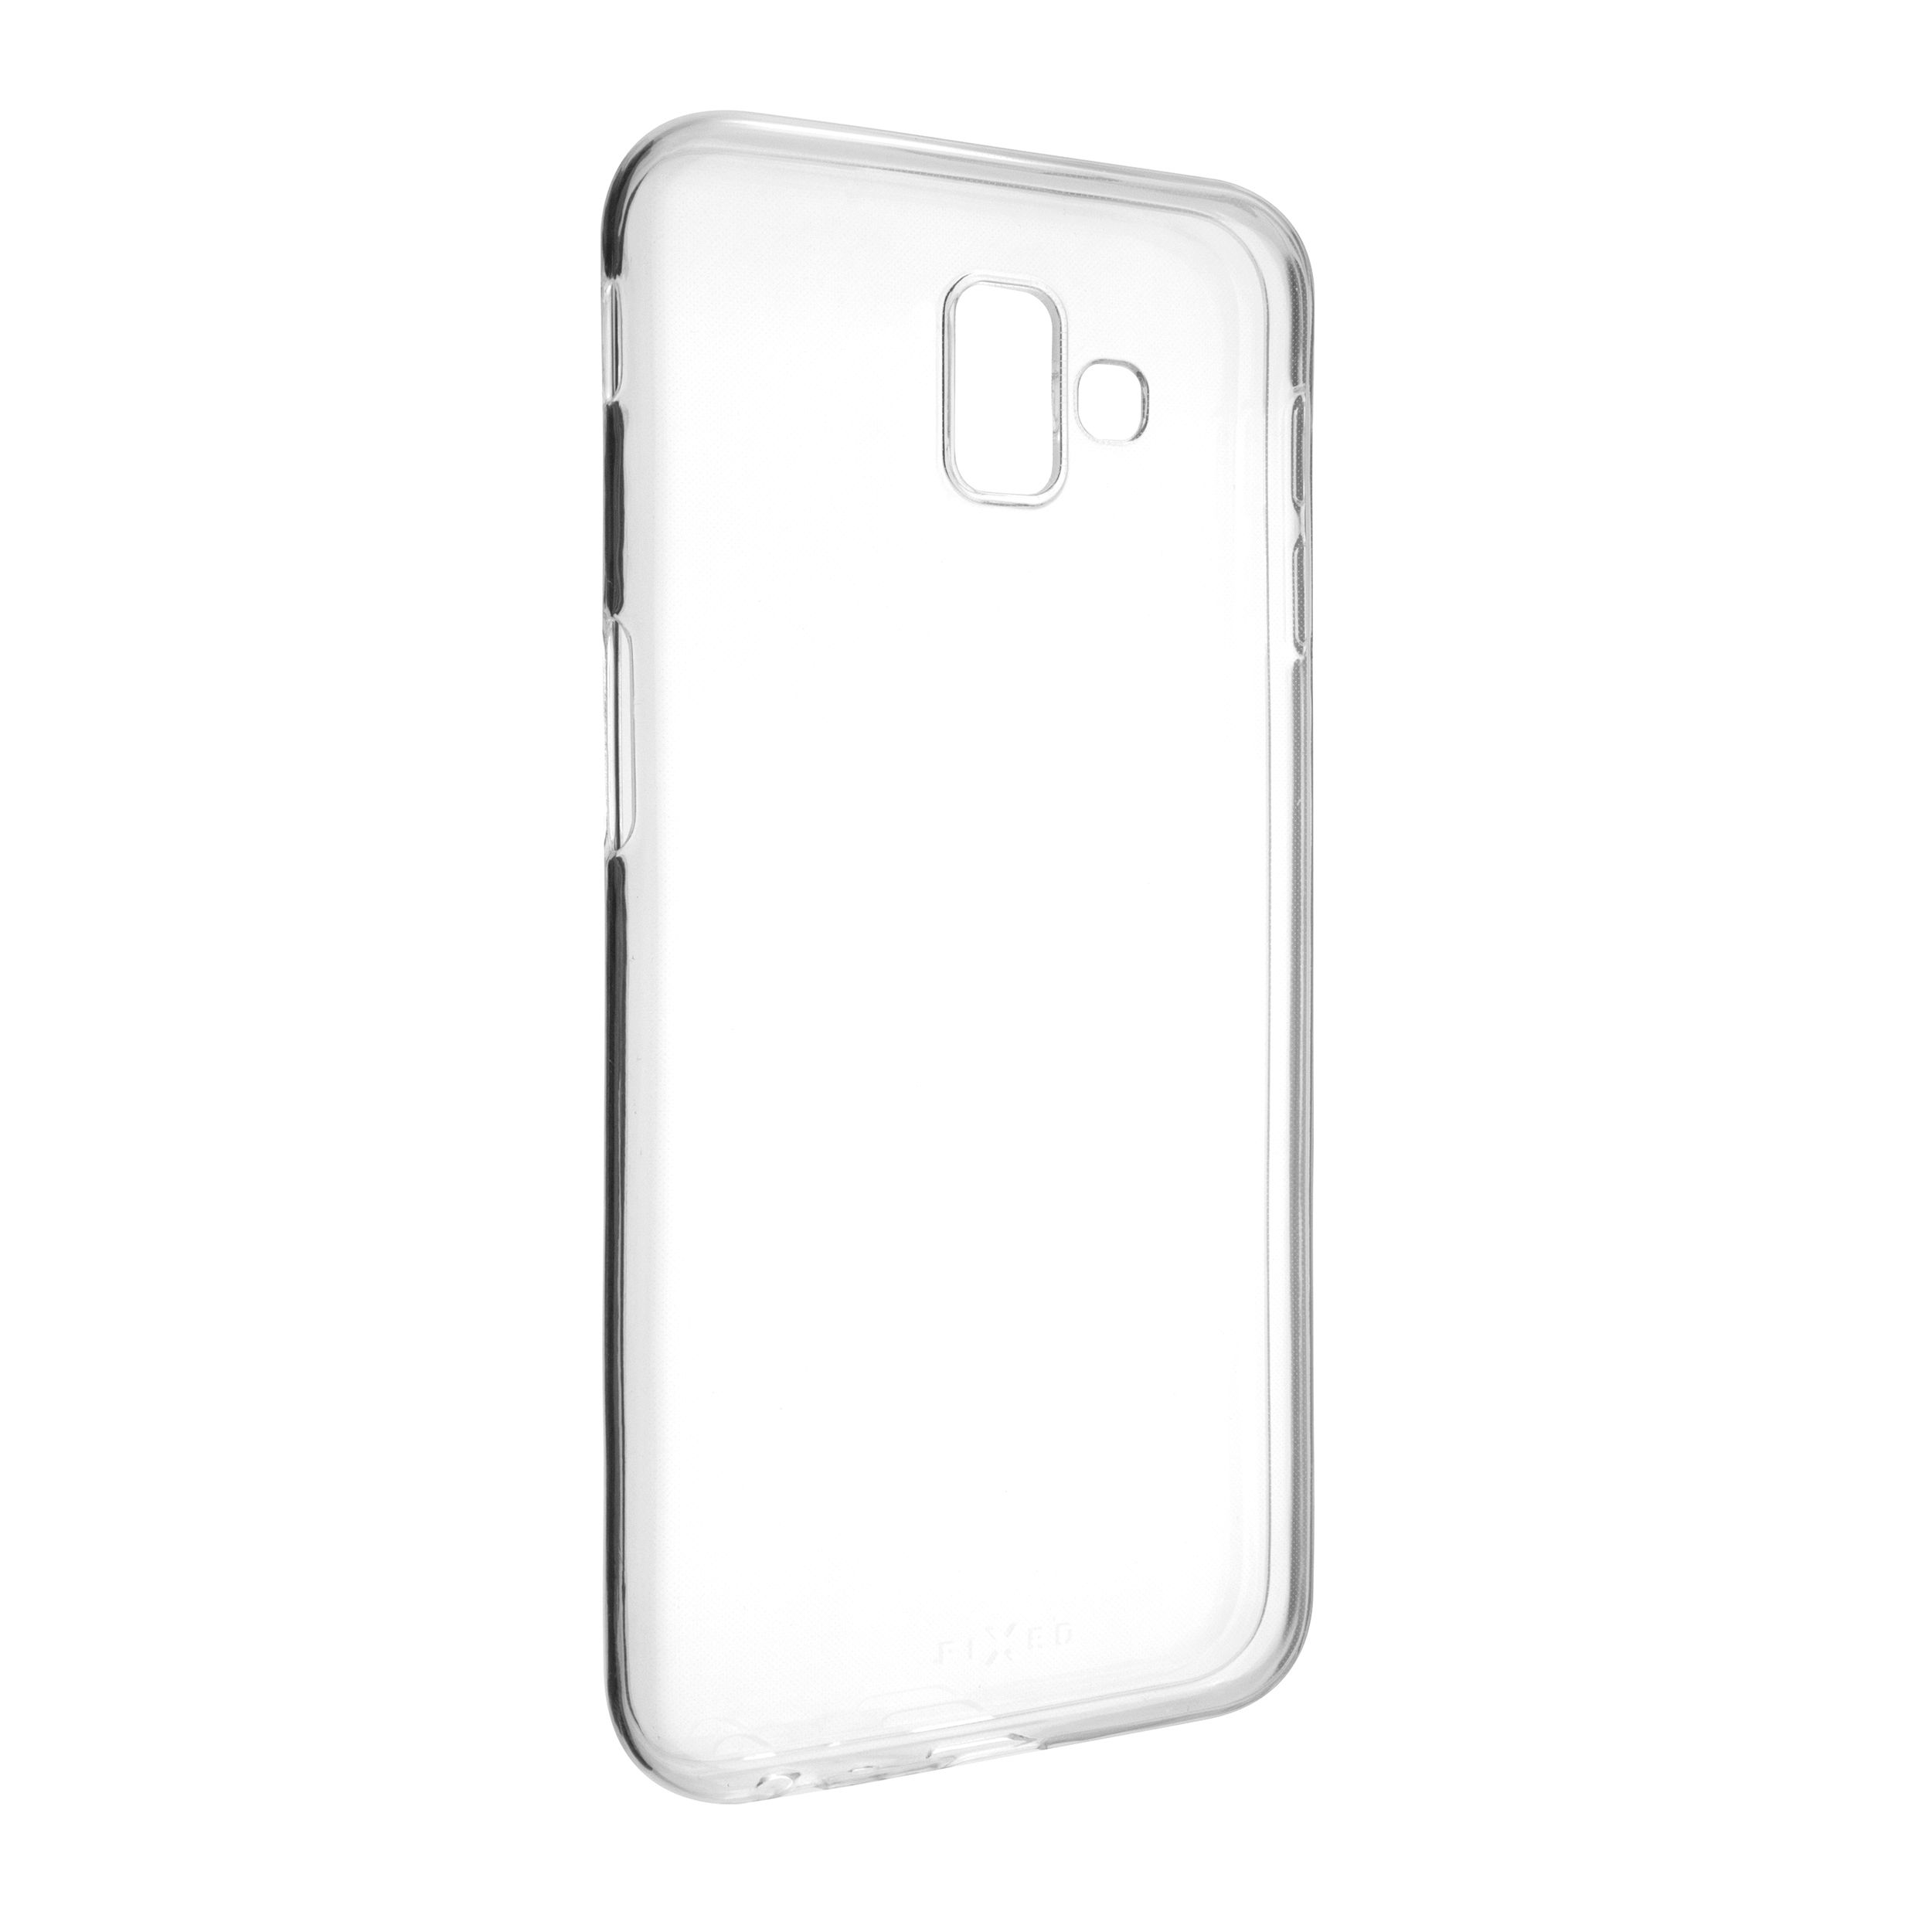 Ultratenké TPU gelové pouzdro FIXED Skin pro Samsung Galaxy J6+ (2018), 0,6 mm, čiré